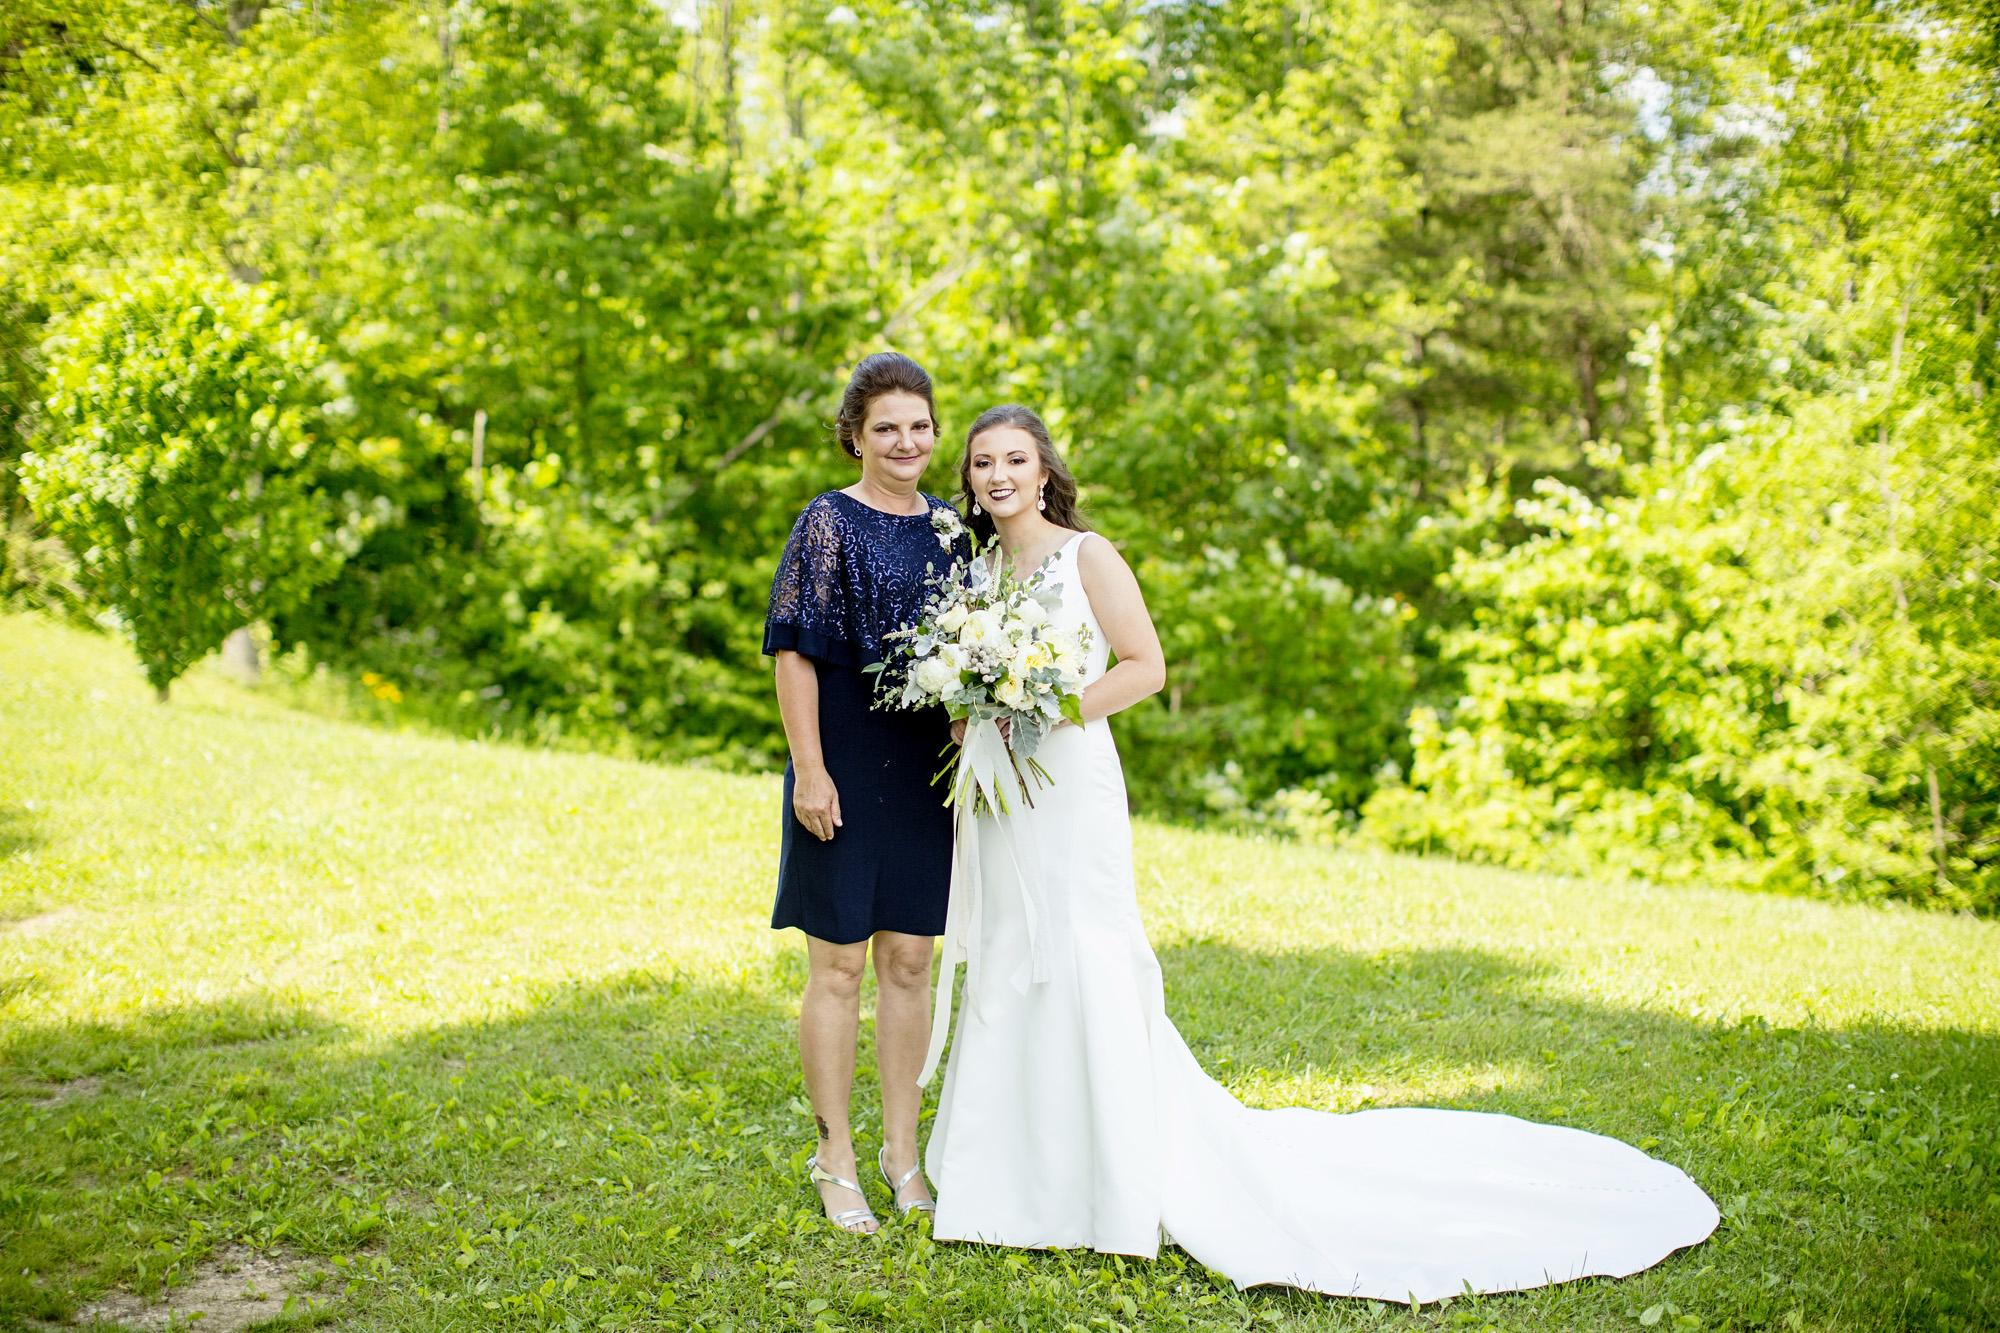 Seriously_Sabrina_Photography_Red_River_Gorge_Wedding_Barn_Robinson40.jpg